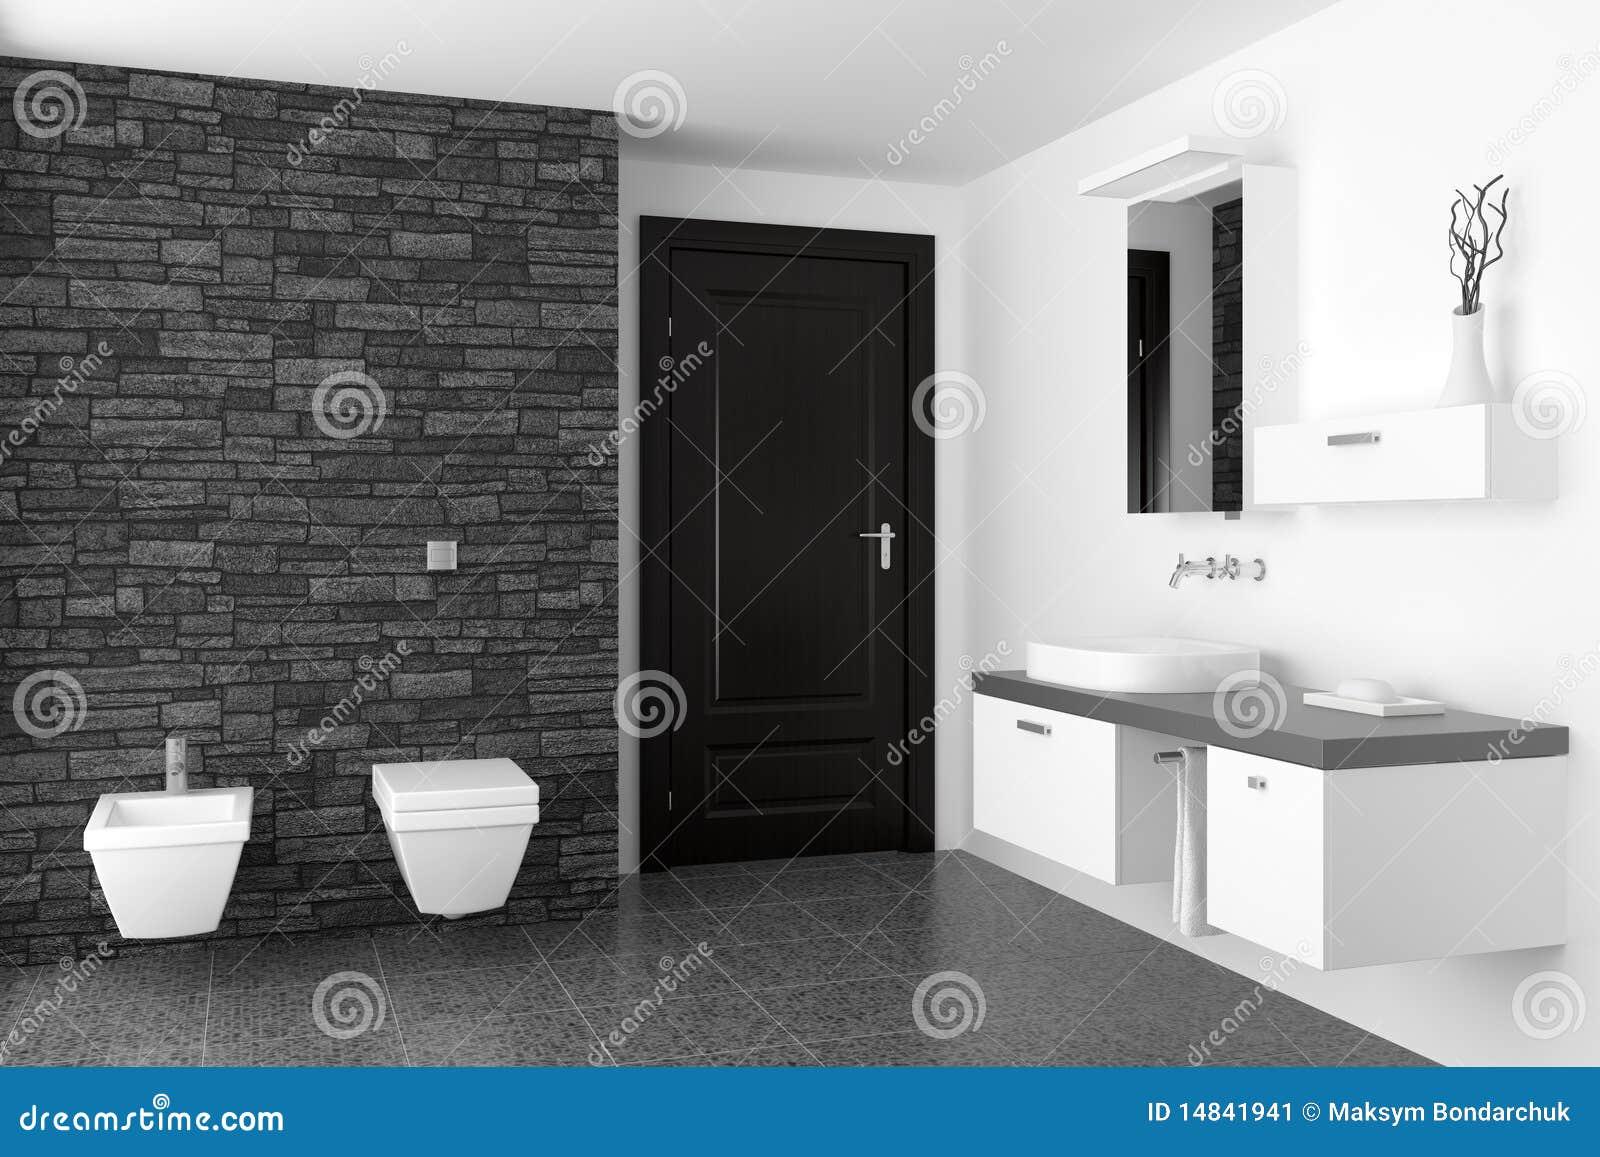 Moderne Badkamers Met Zwarte Steenmuur Stock Afbeelding - Afbeelding ...